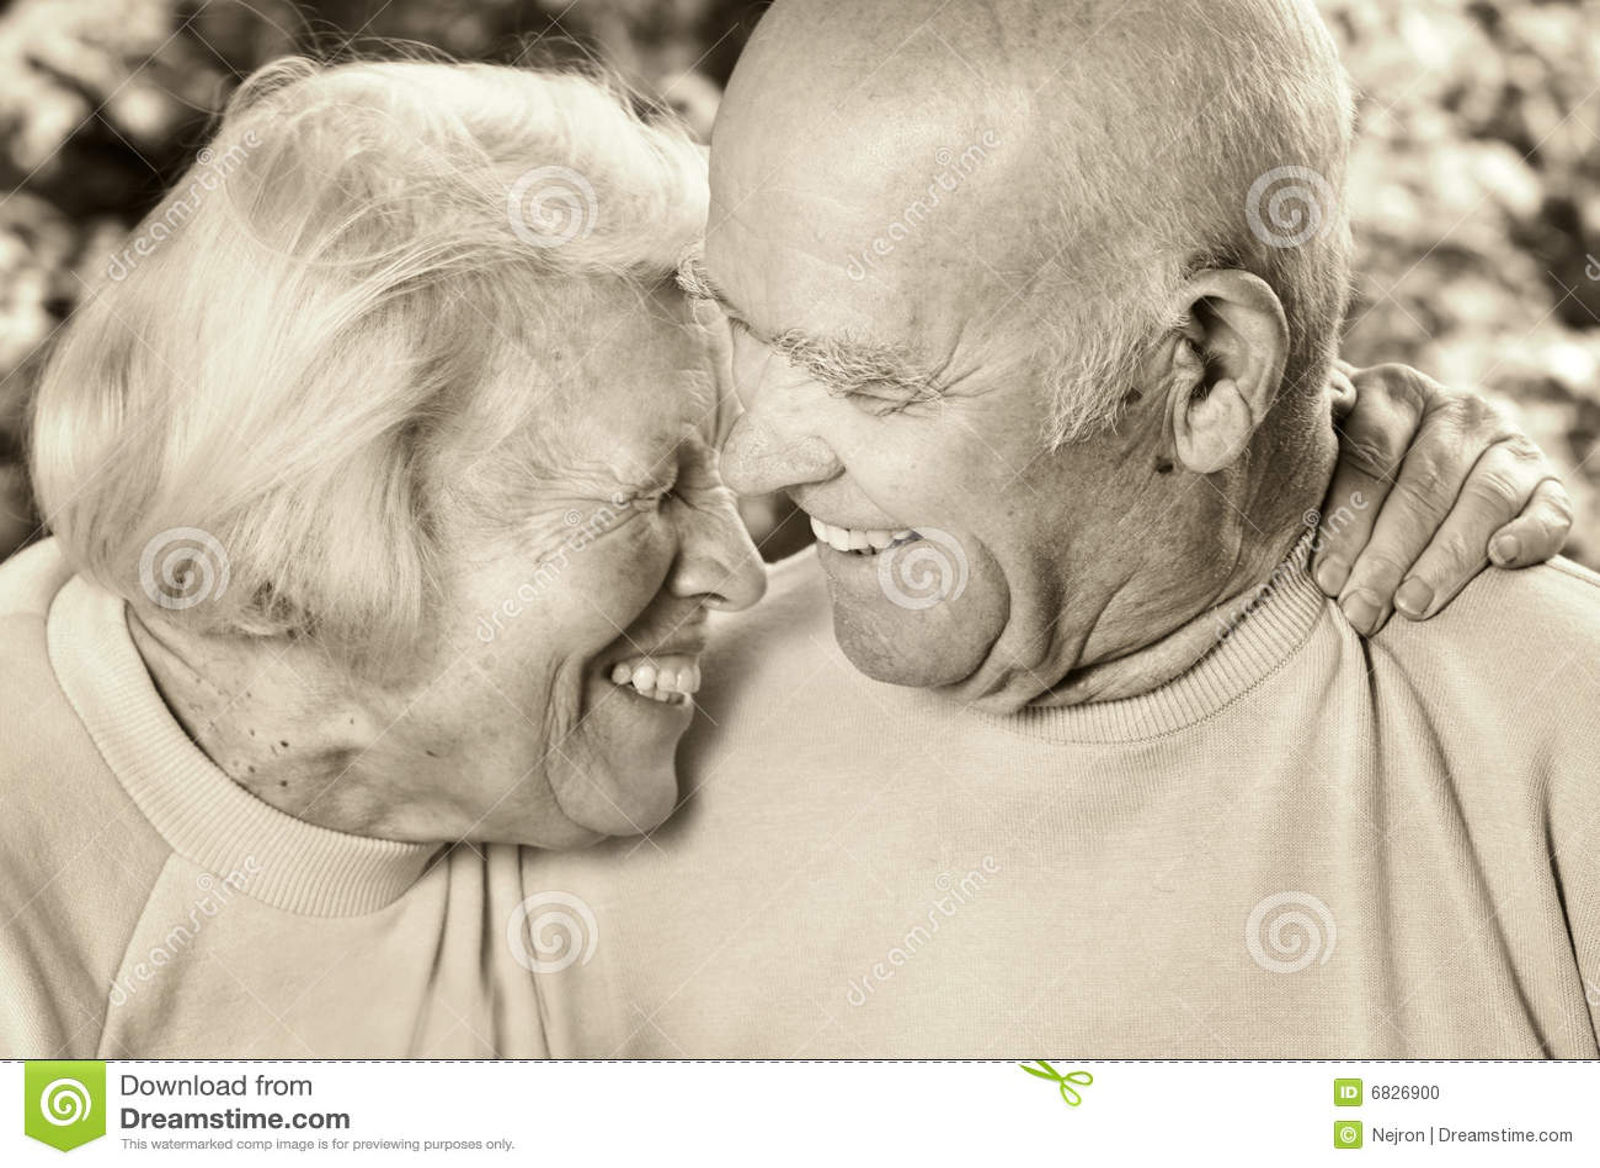 starie-dedi-trahayut-molodenkih-porno